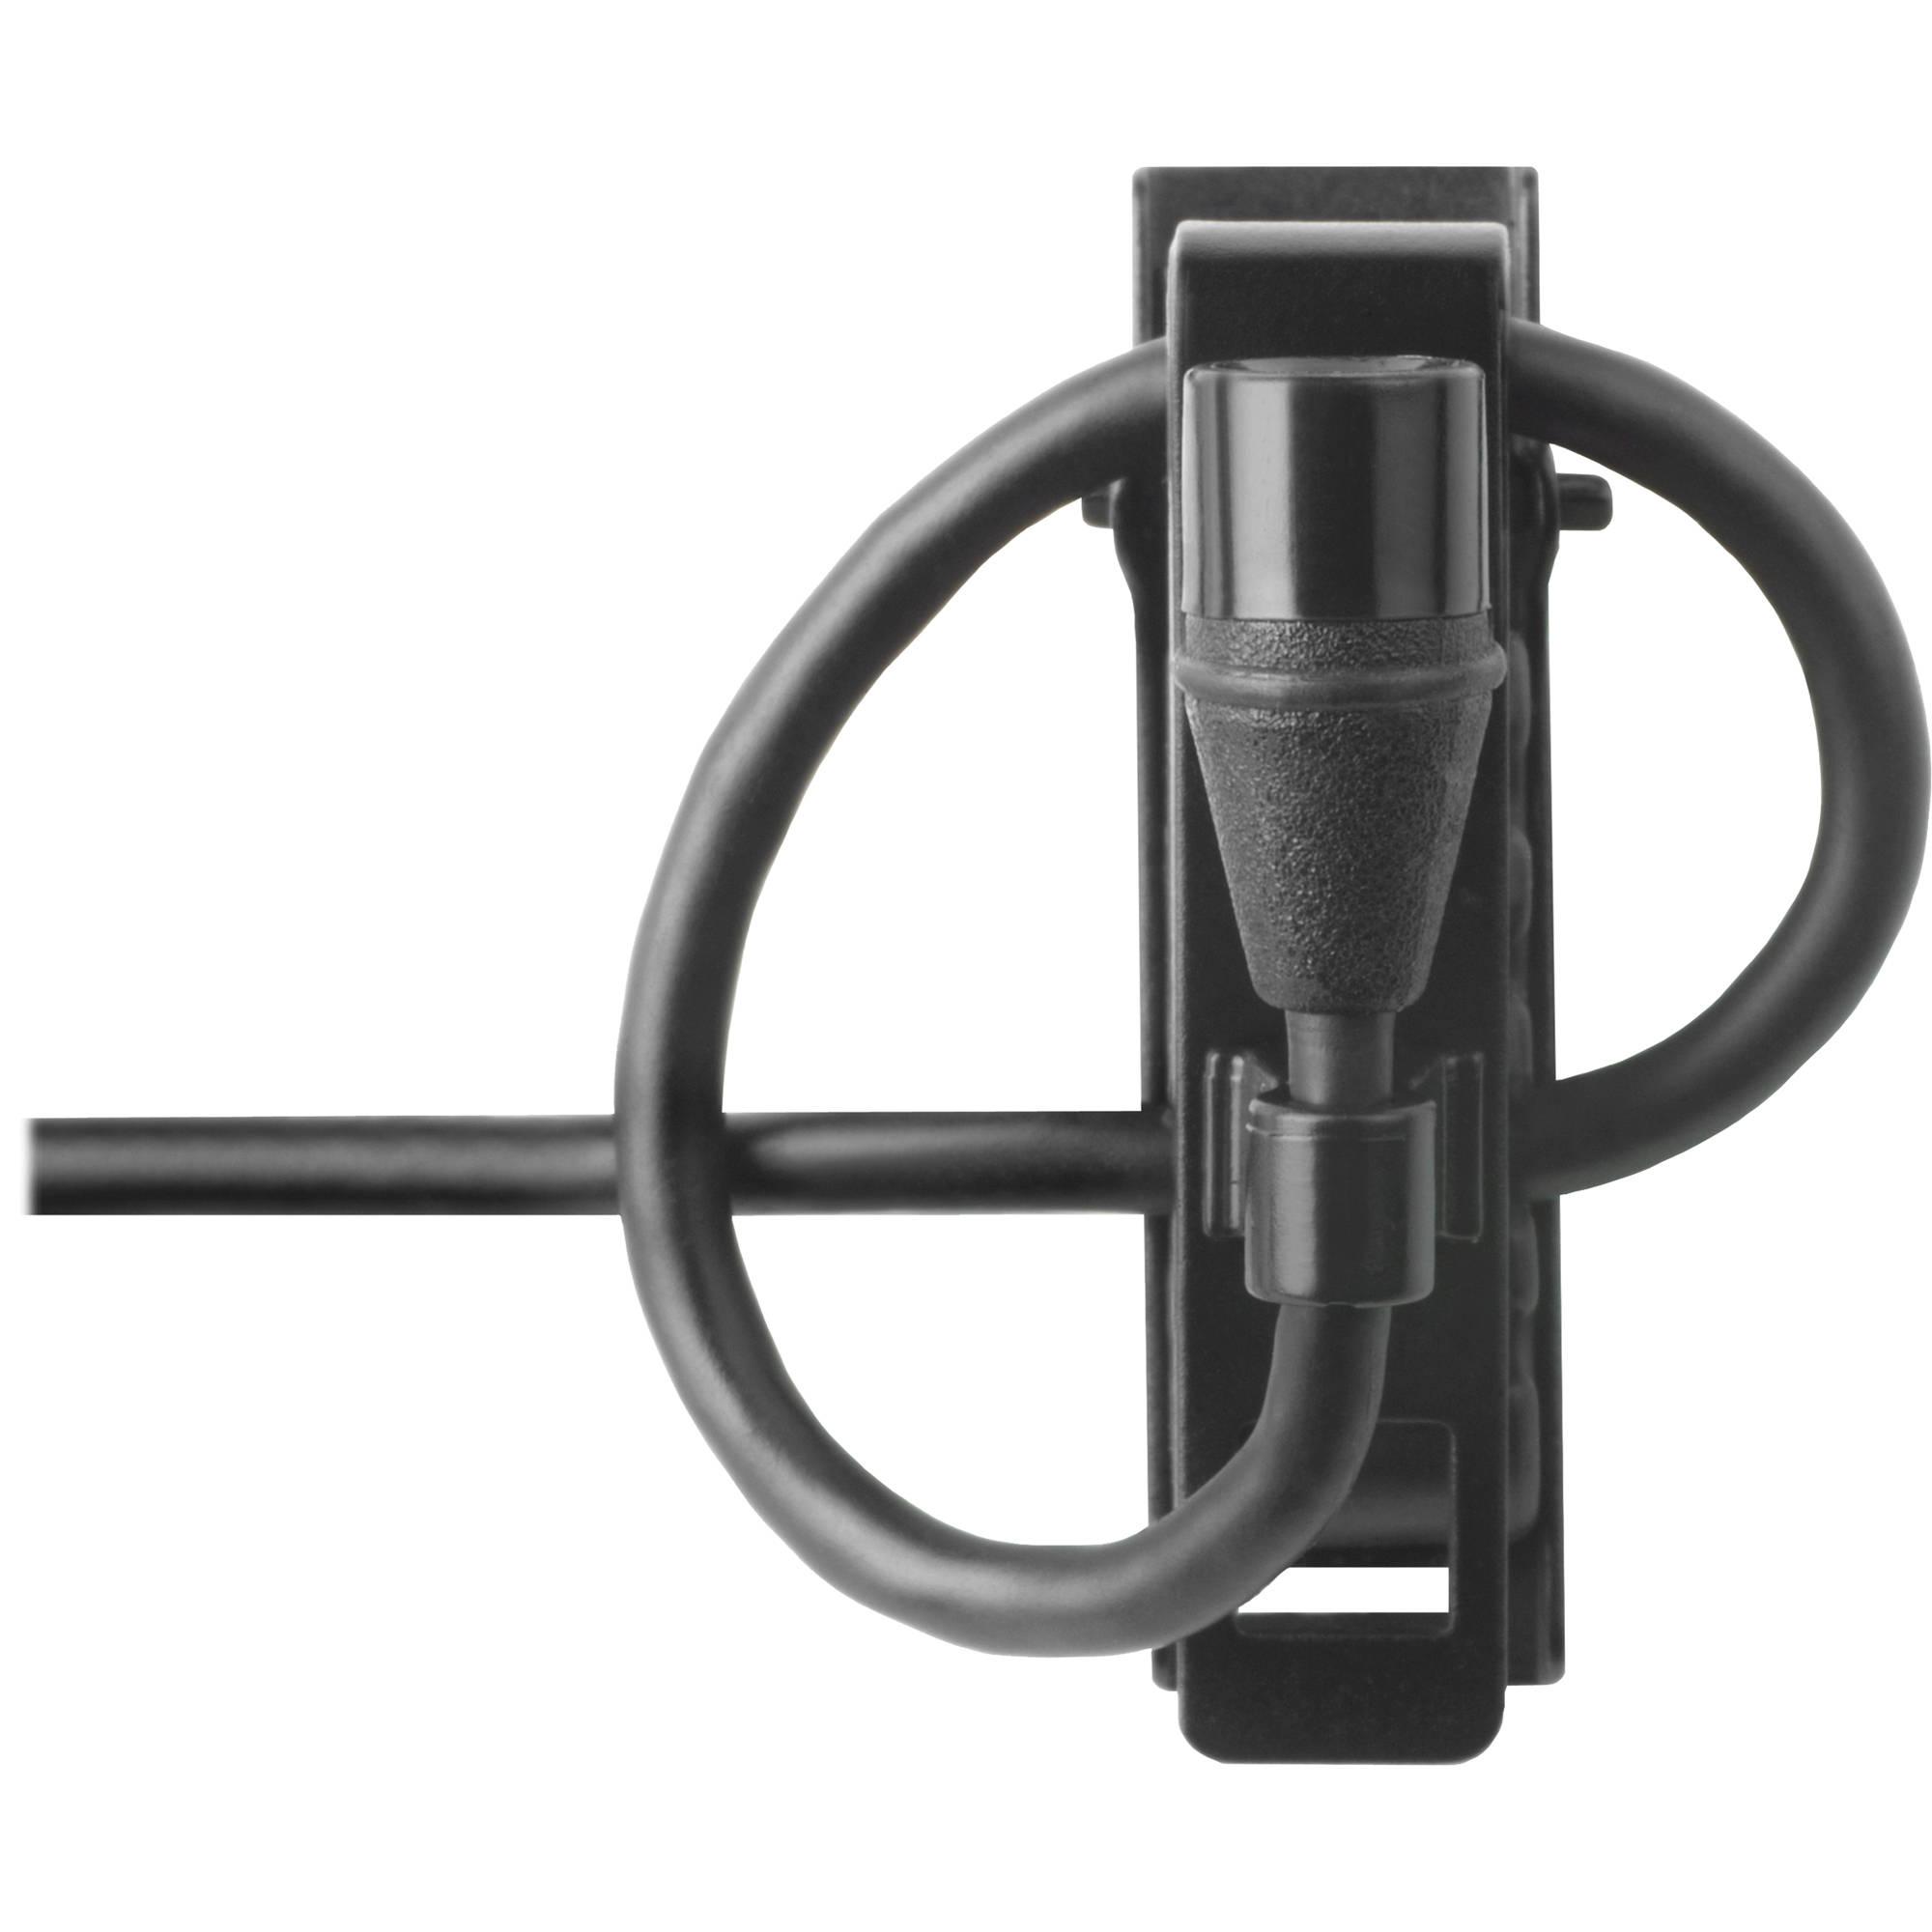 shure mx150 subminiature lavalier microphone mx150b o xlr b h. Black Bedroom Furniture Sets. Home Design Ideas